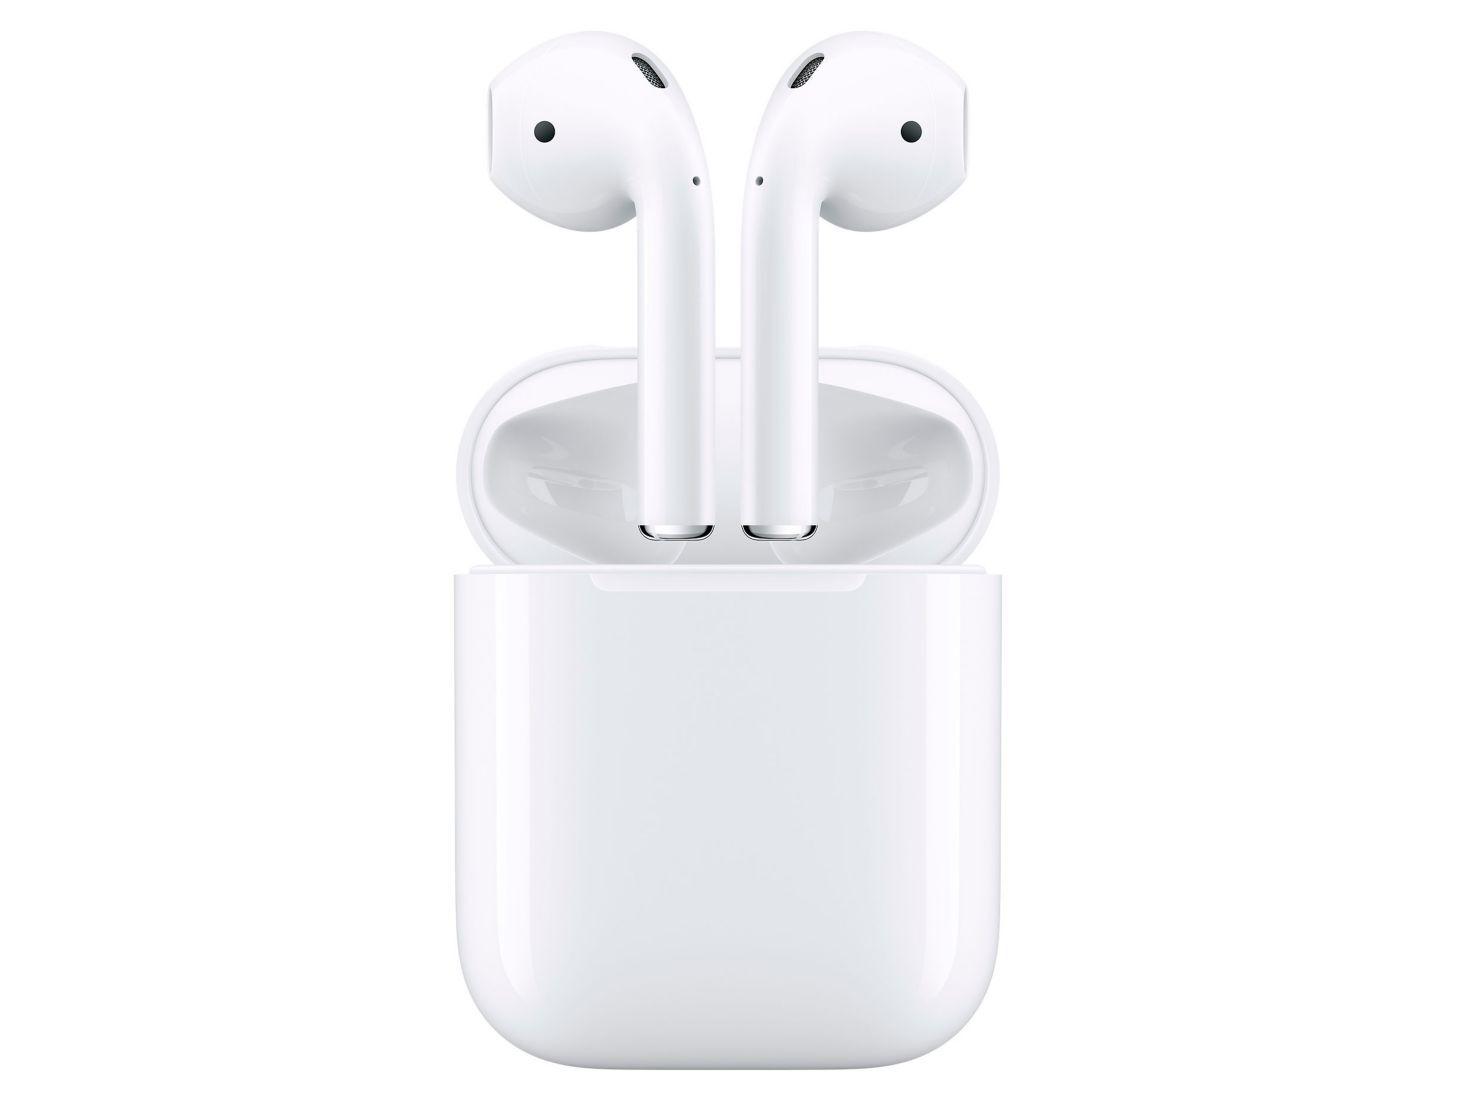 531923bc71a Audífonos Apple AirPods Bluetooth en Accesorios de Celulares | Paris